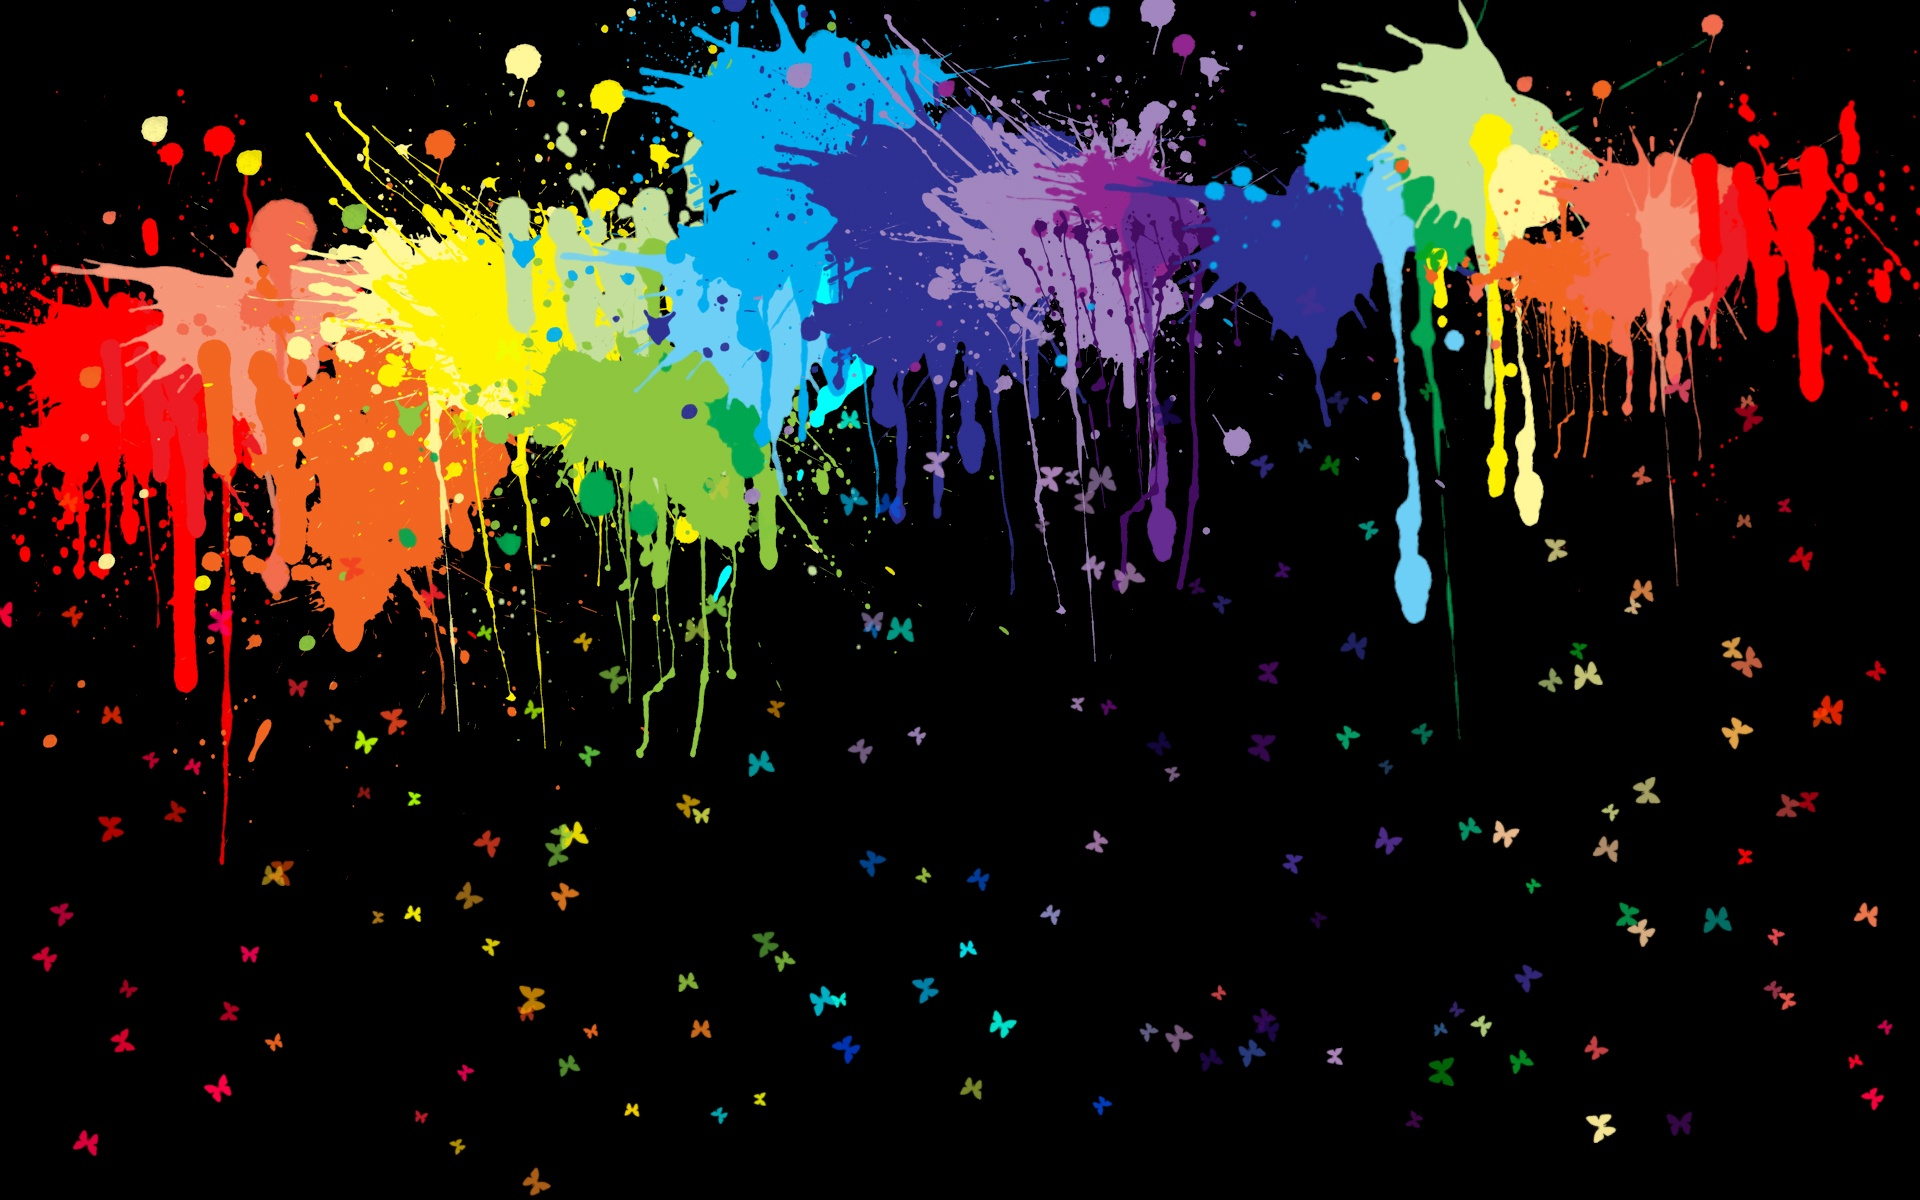 Salpicaduras de pintura abstracta fondos de pantalla 1920x1200 fondos de descarga - Salpicaduras de pintura ...